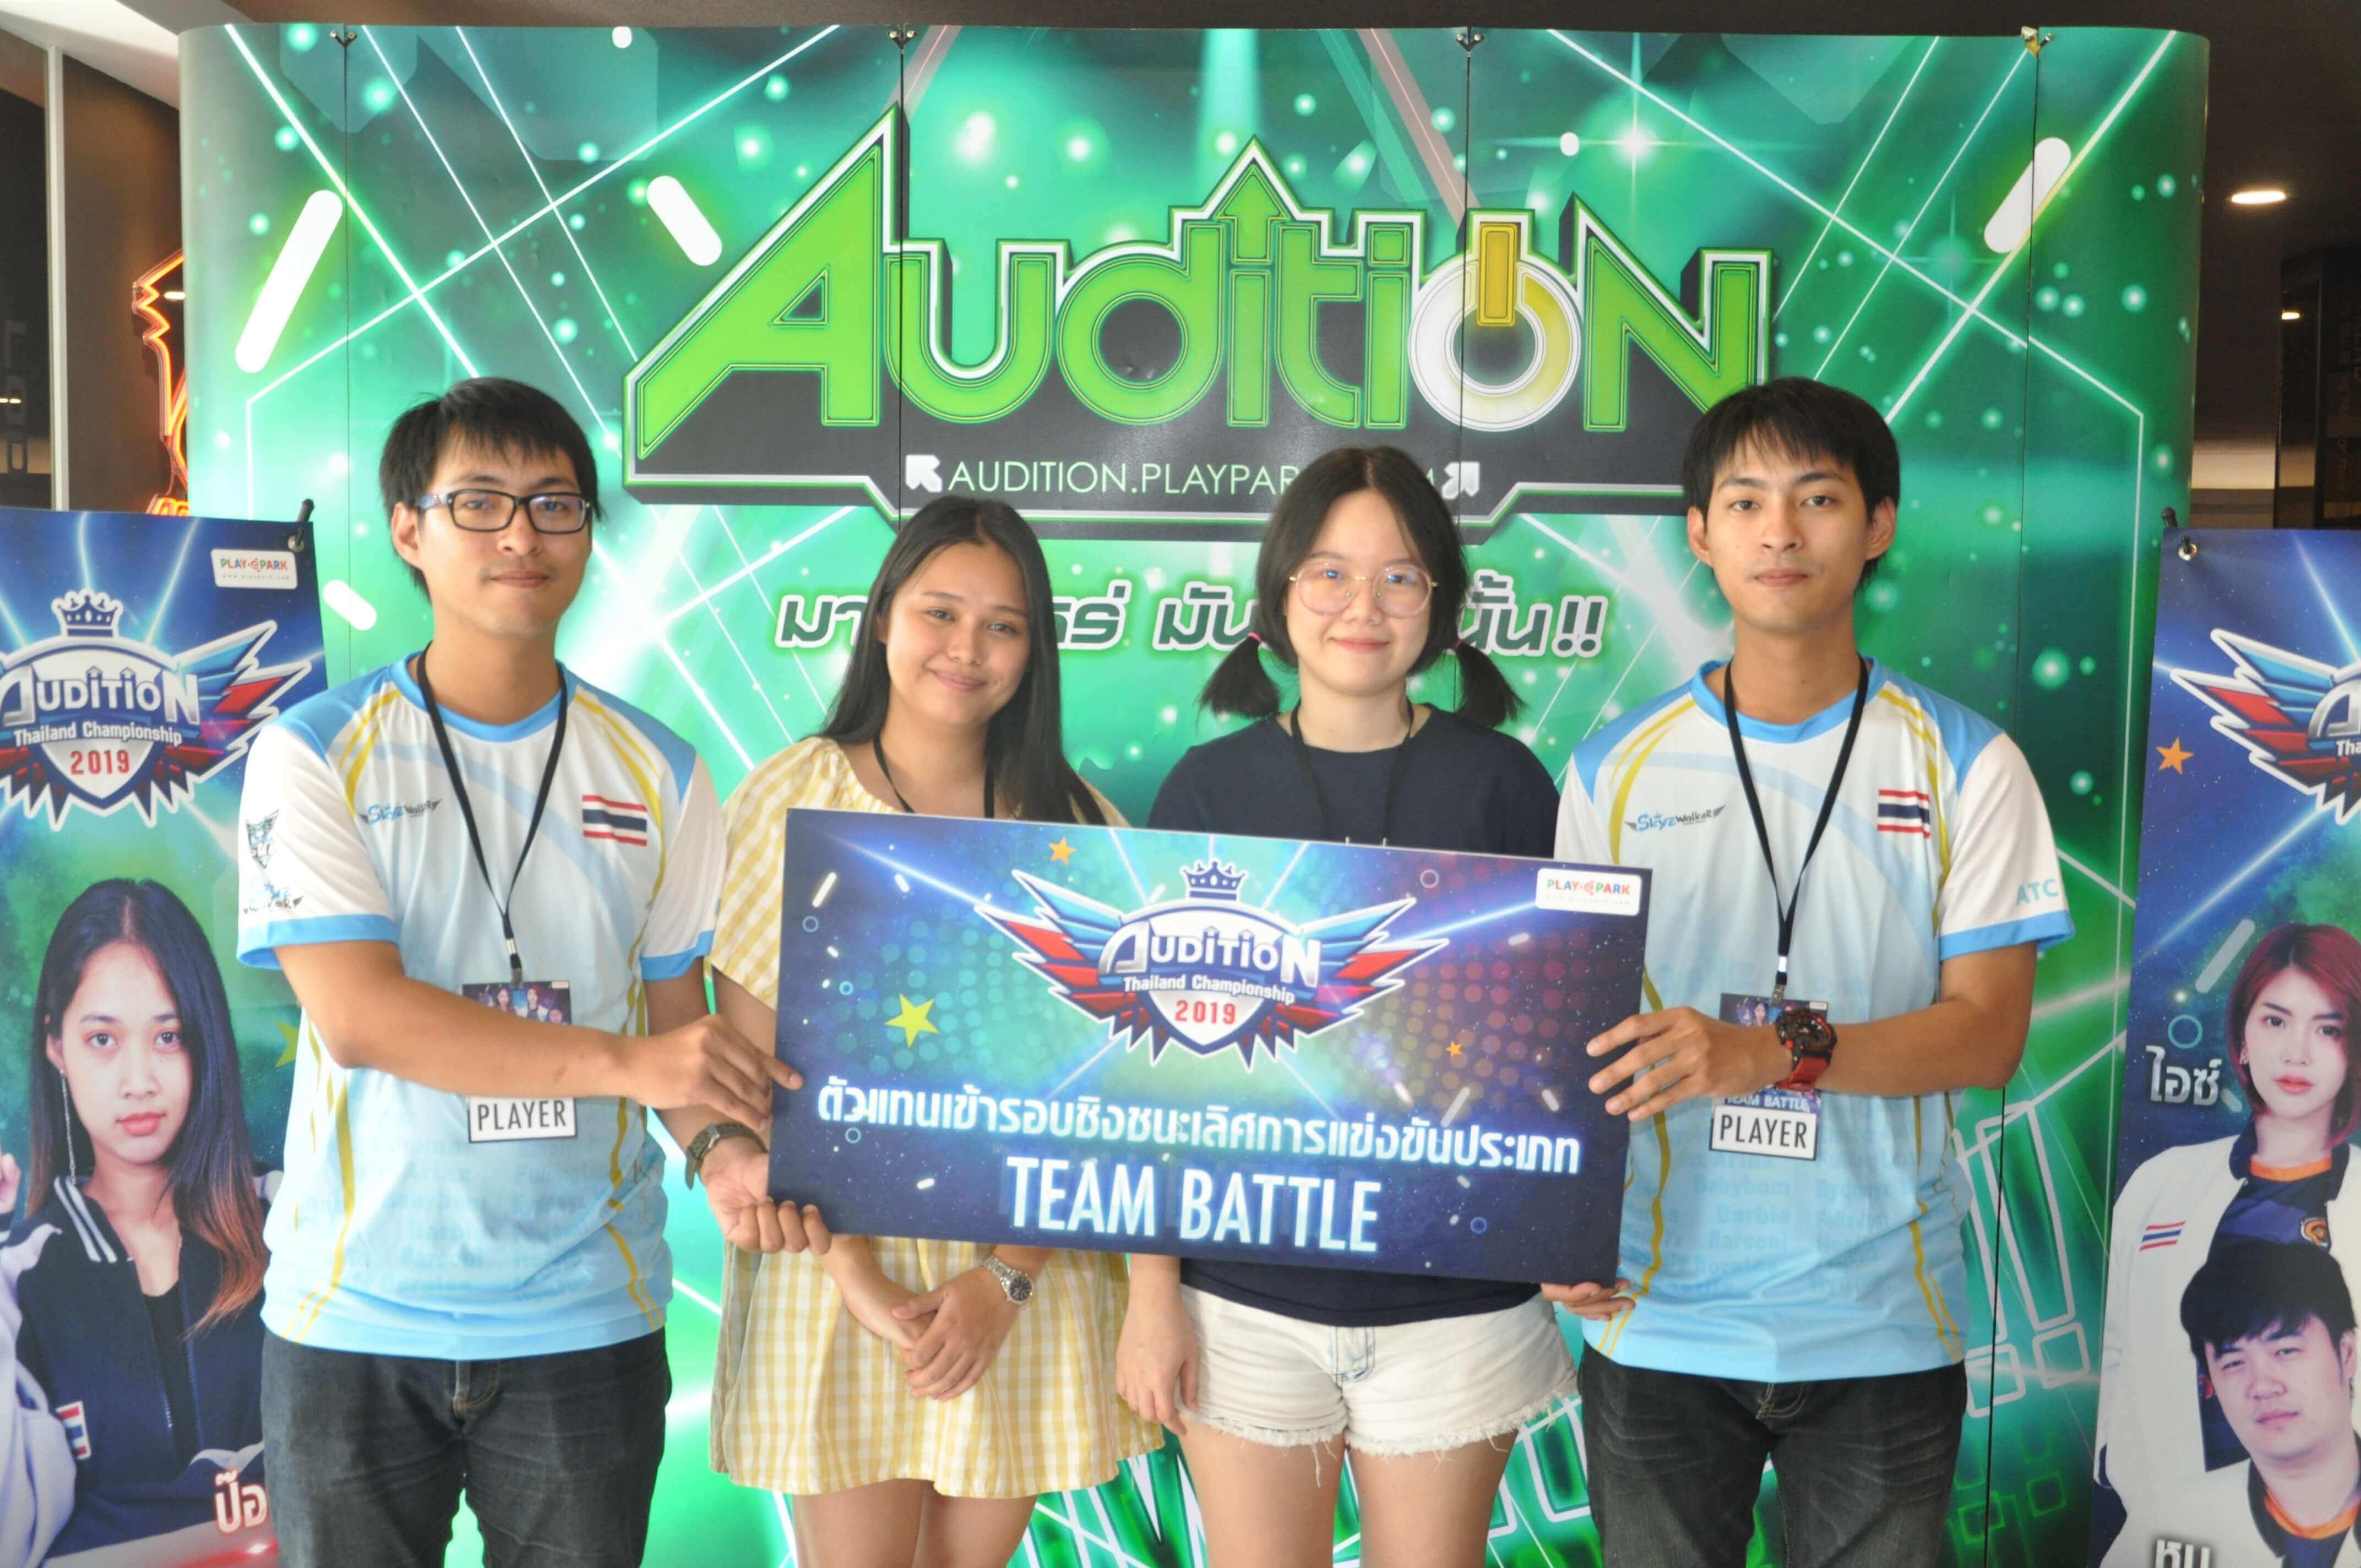 [AUDITION] ประกาศผลการแข่ง ATC 2019 รอบคัดเลือก TEAM BATTLE